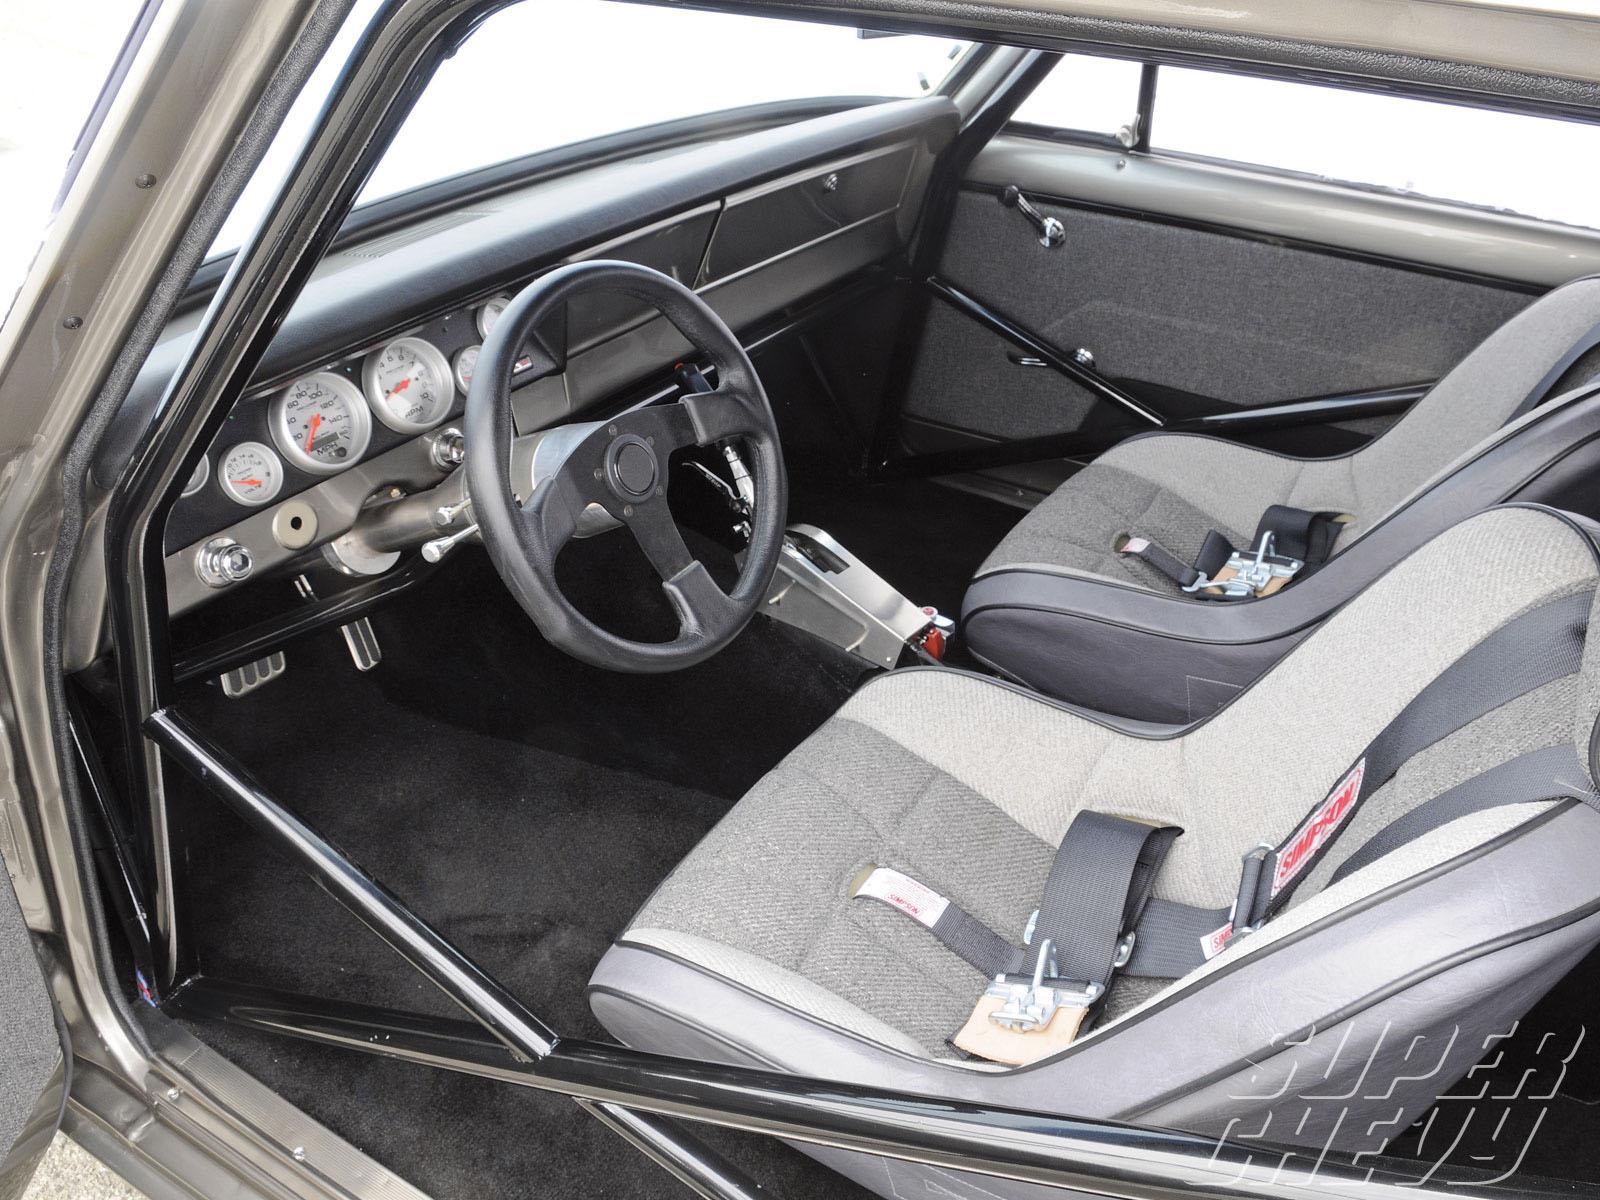 Chevy Nova 67